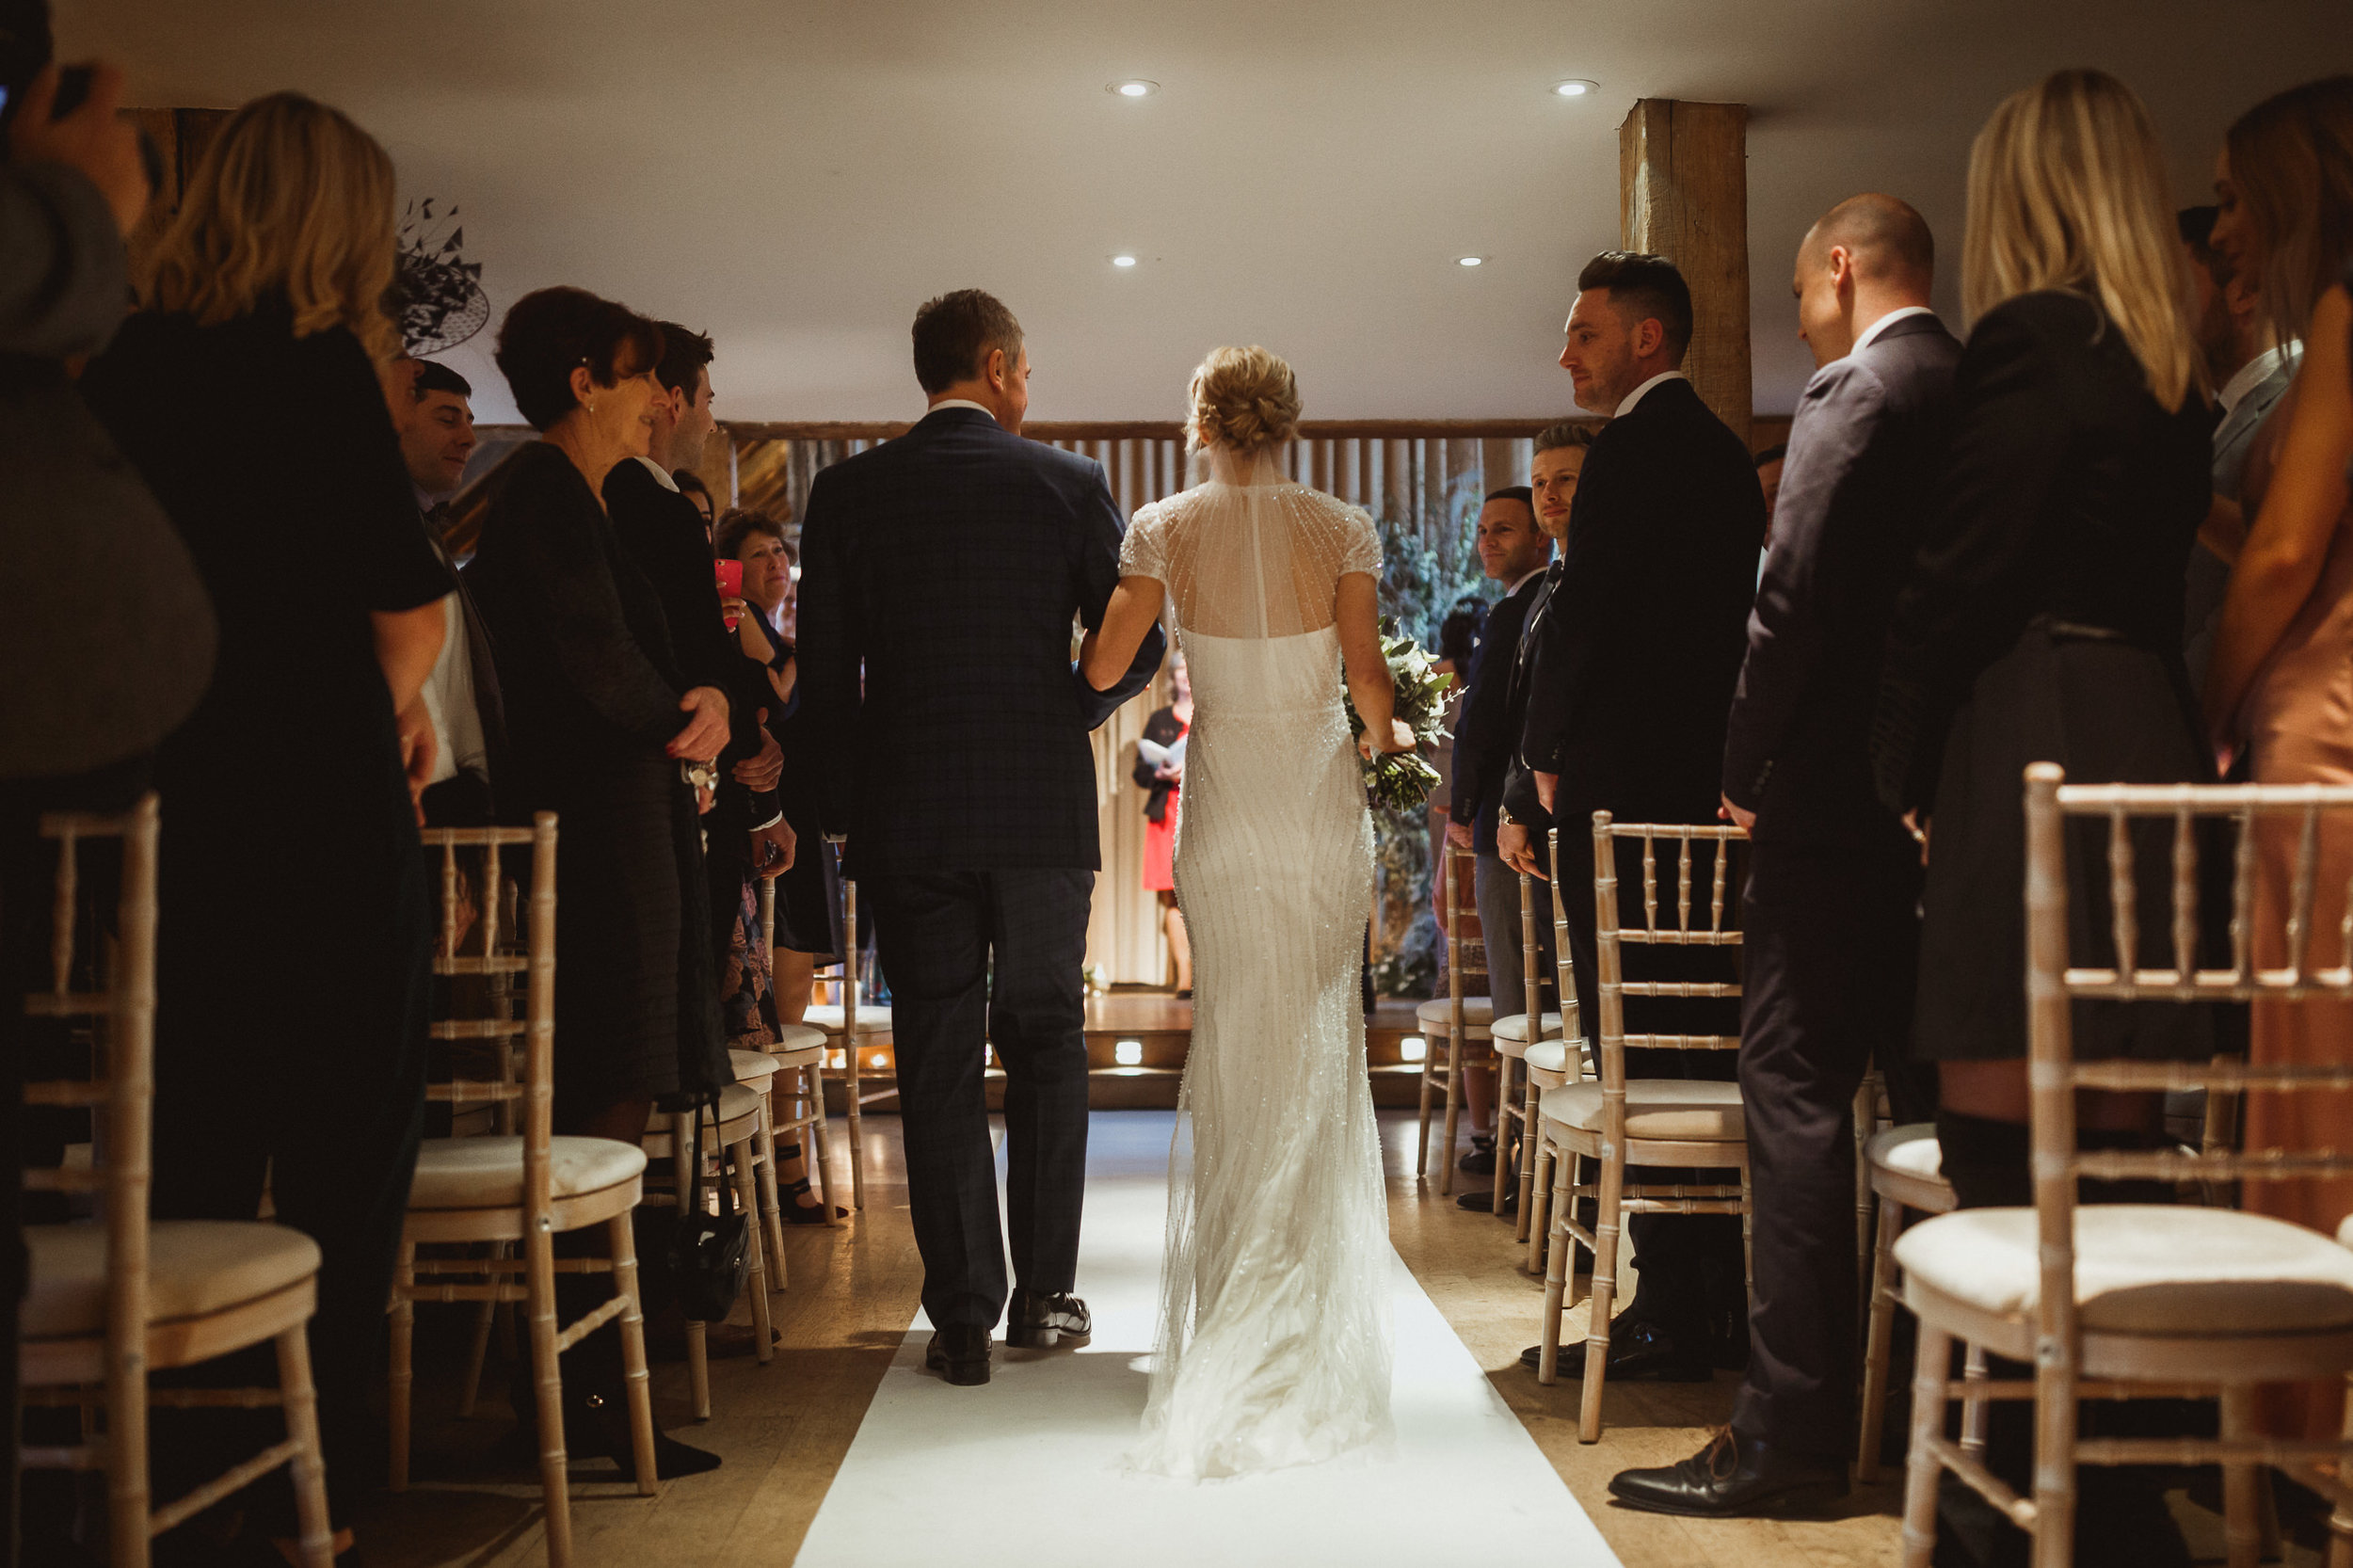 London_wedding_photographer_gione_da_silva_carelle_paul116.jpg